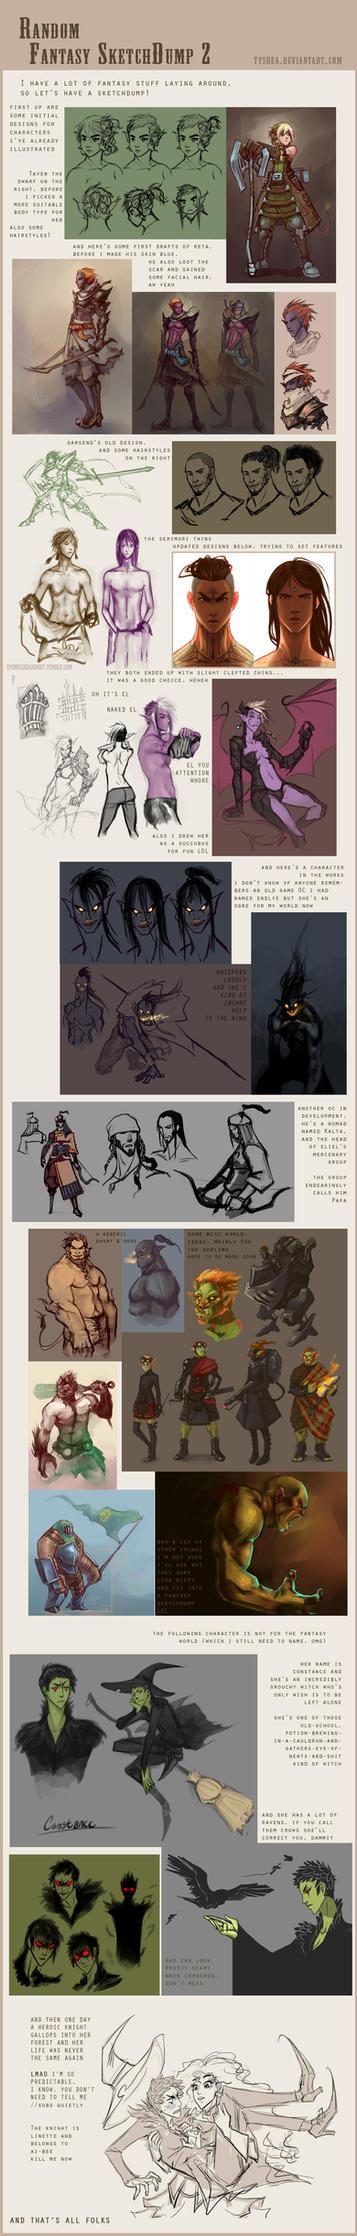 Fantasy Sketchdump by Tyshea